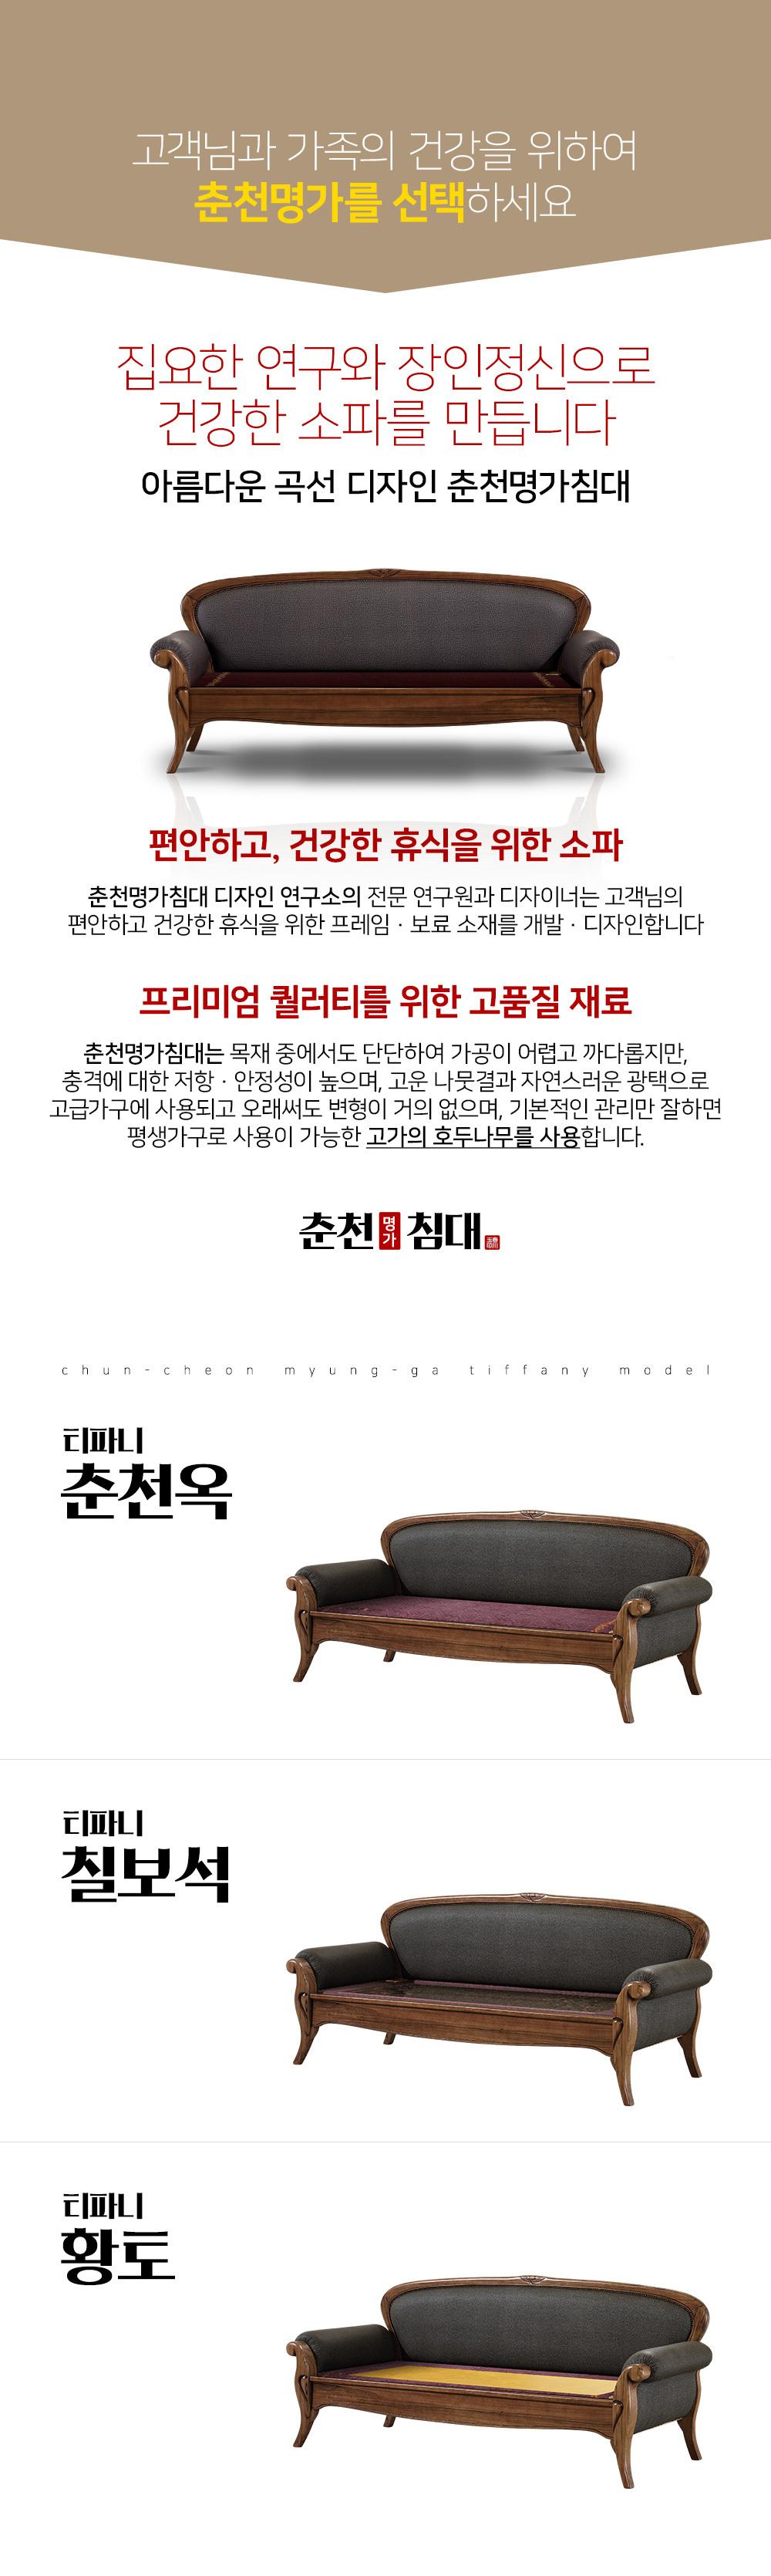 couch_jade_02.jpg